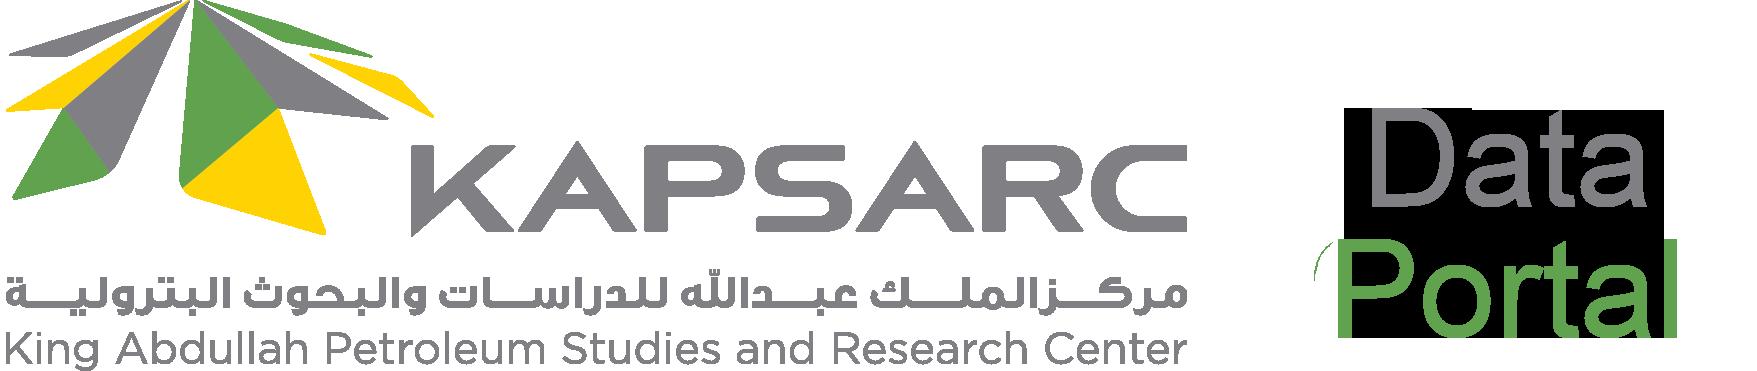 KAPSARC Data Portal